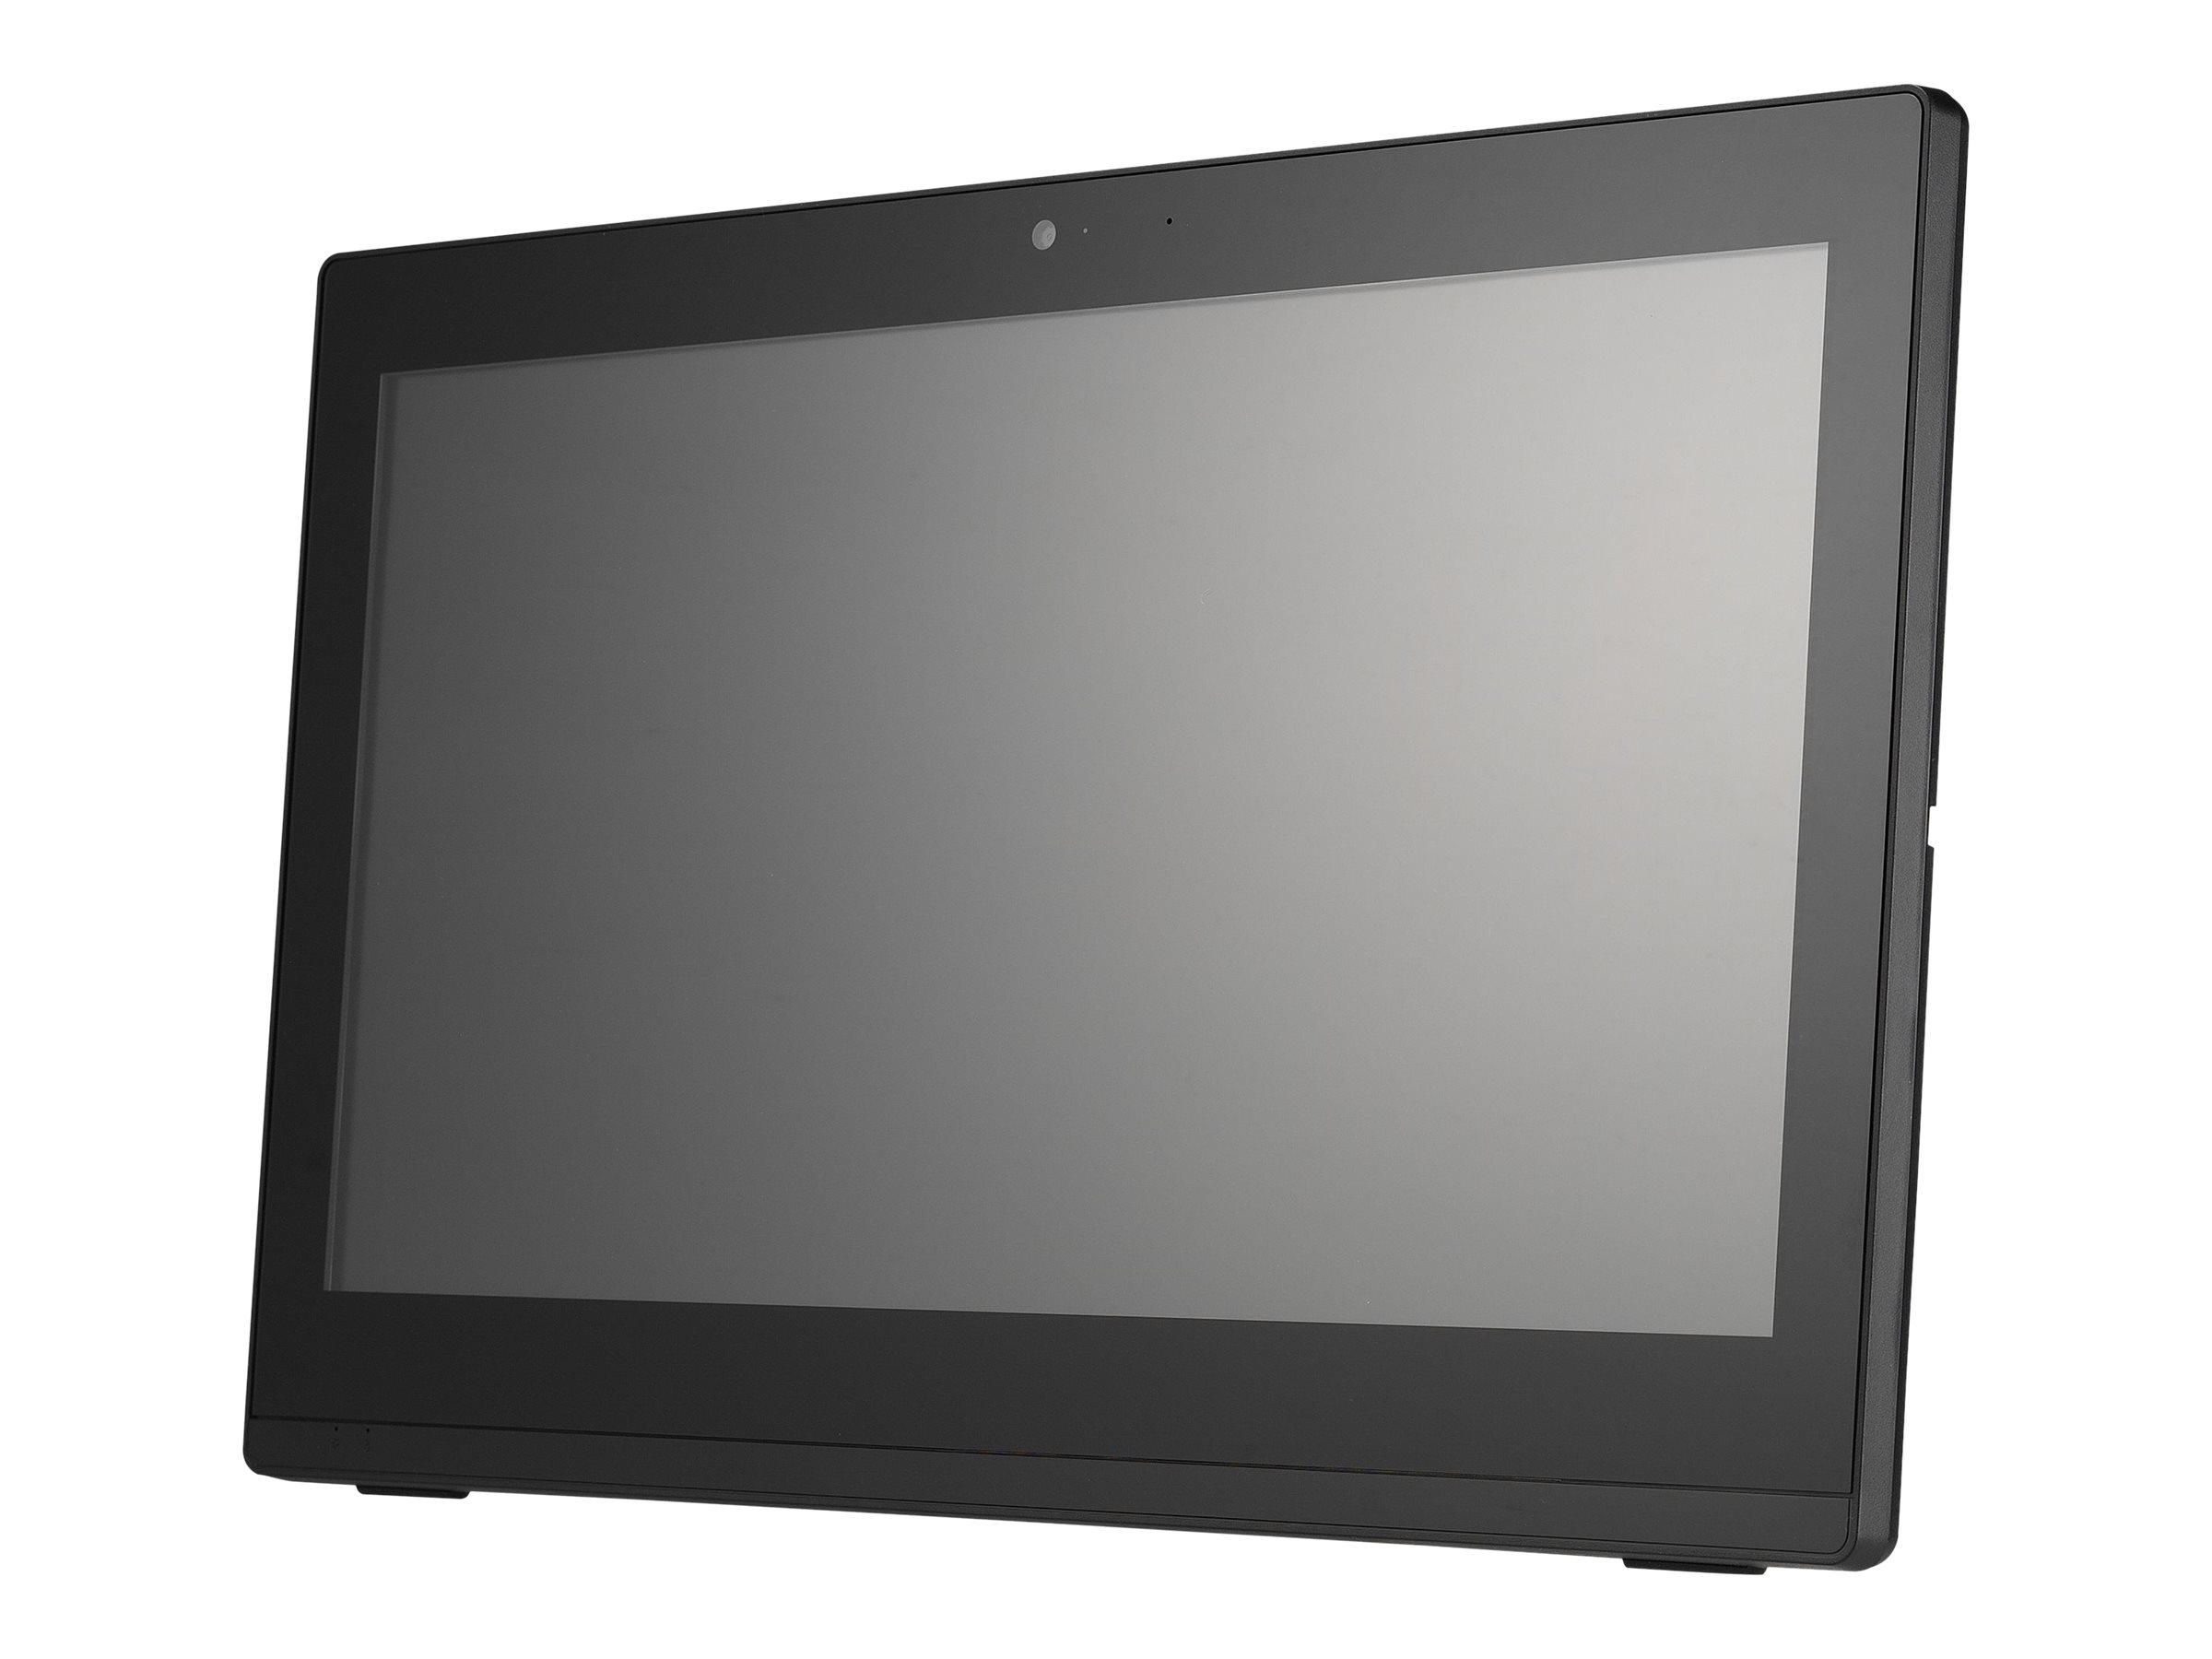 Shuttle XPC POS P900 - All-in-One (Komplettlösung) - 1 x Celeron 3865U / 1.8 GHz ULV - RAM 4 GB - SSD 120 GB - HD Graphics 610